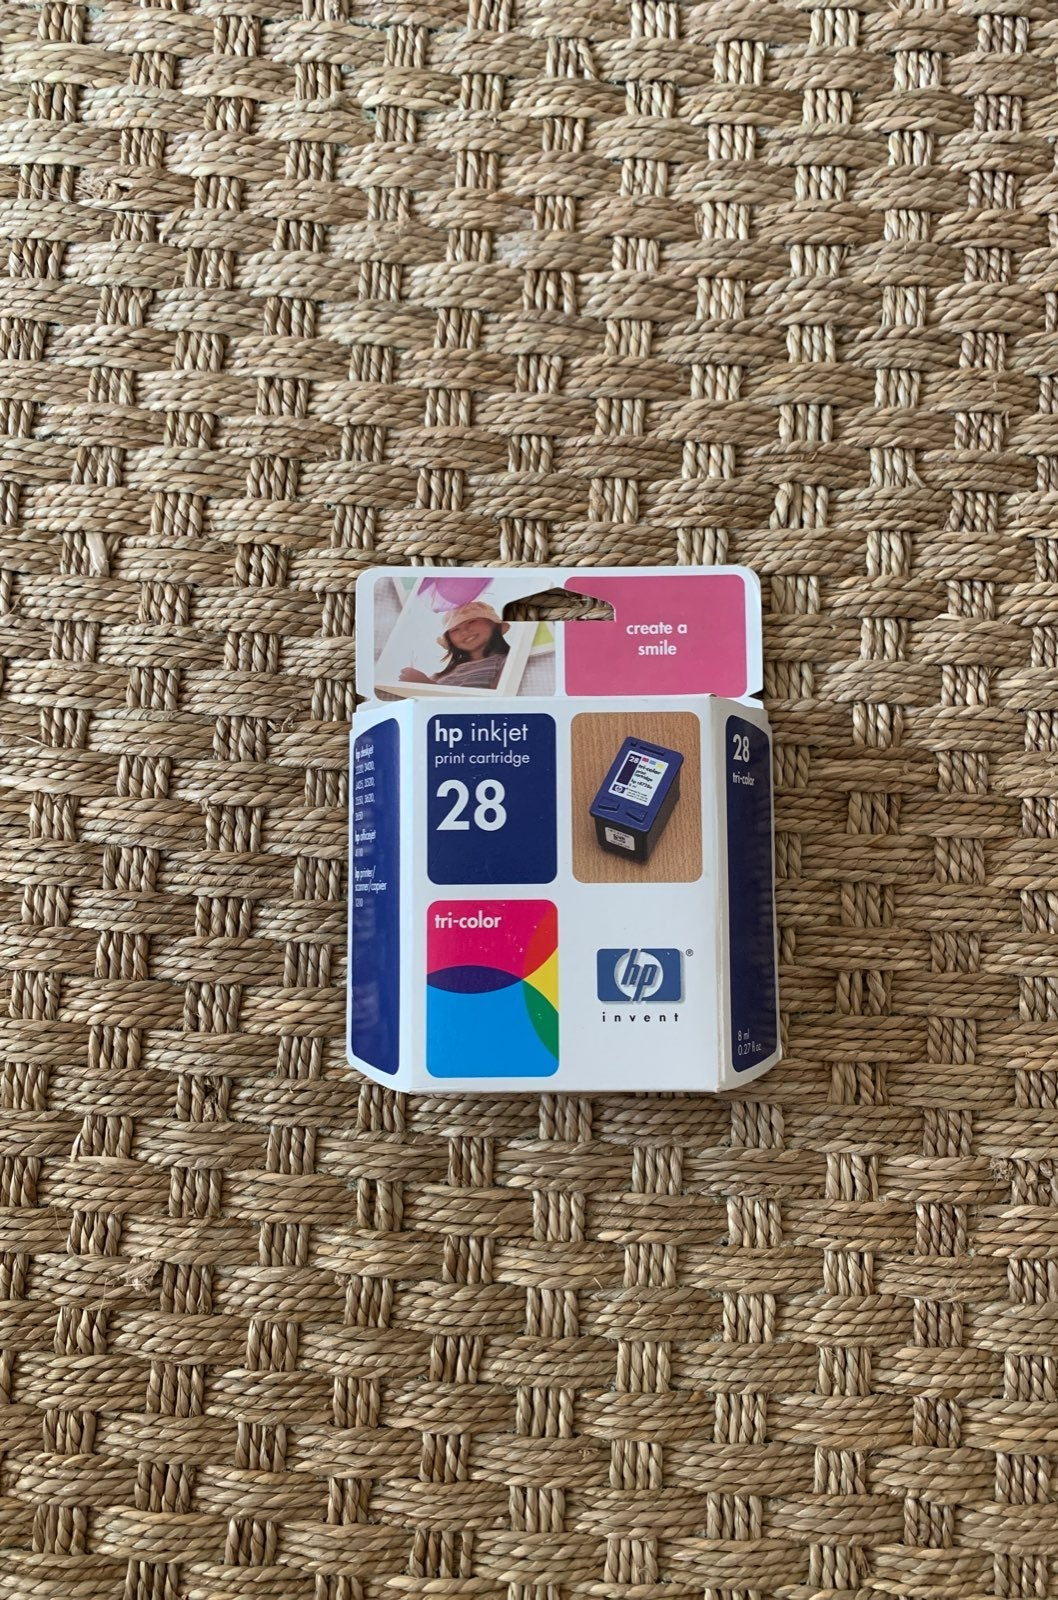 HP inkjet print cartridge 28 tri-color